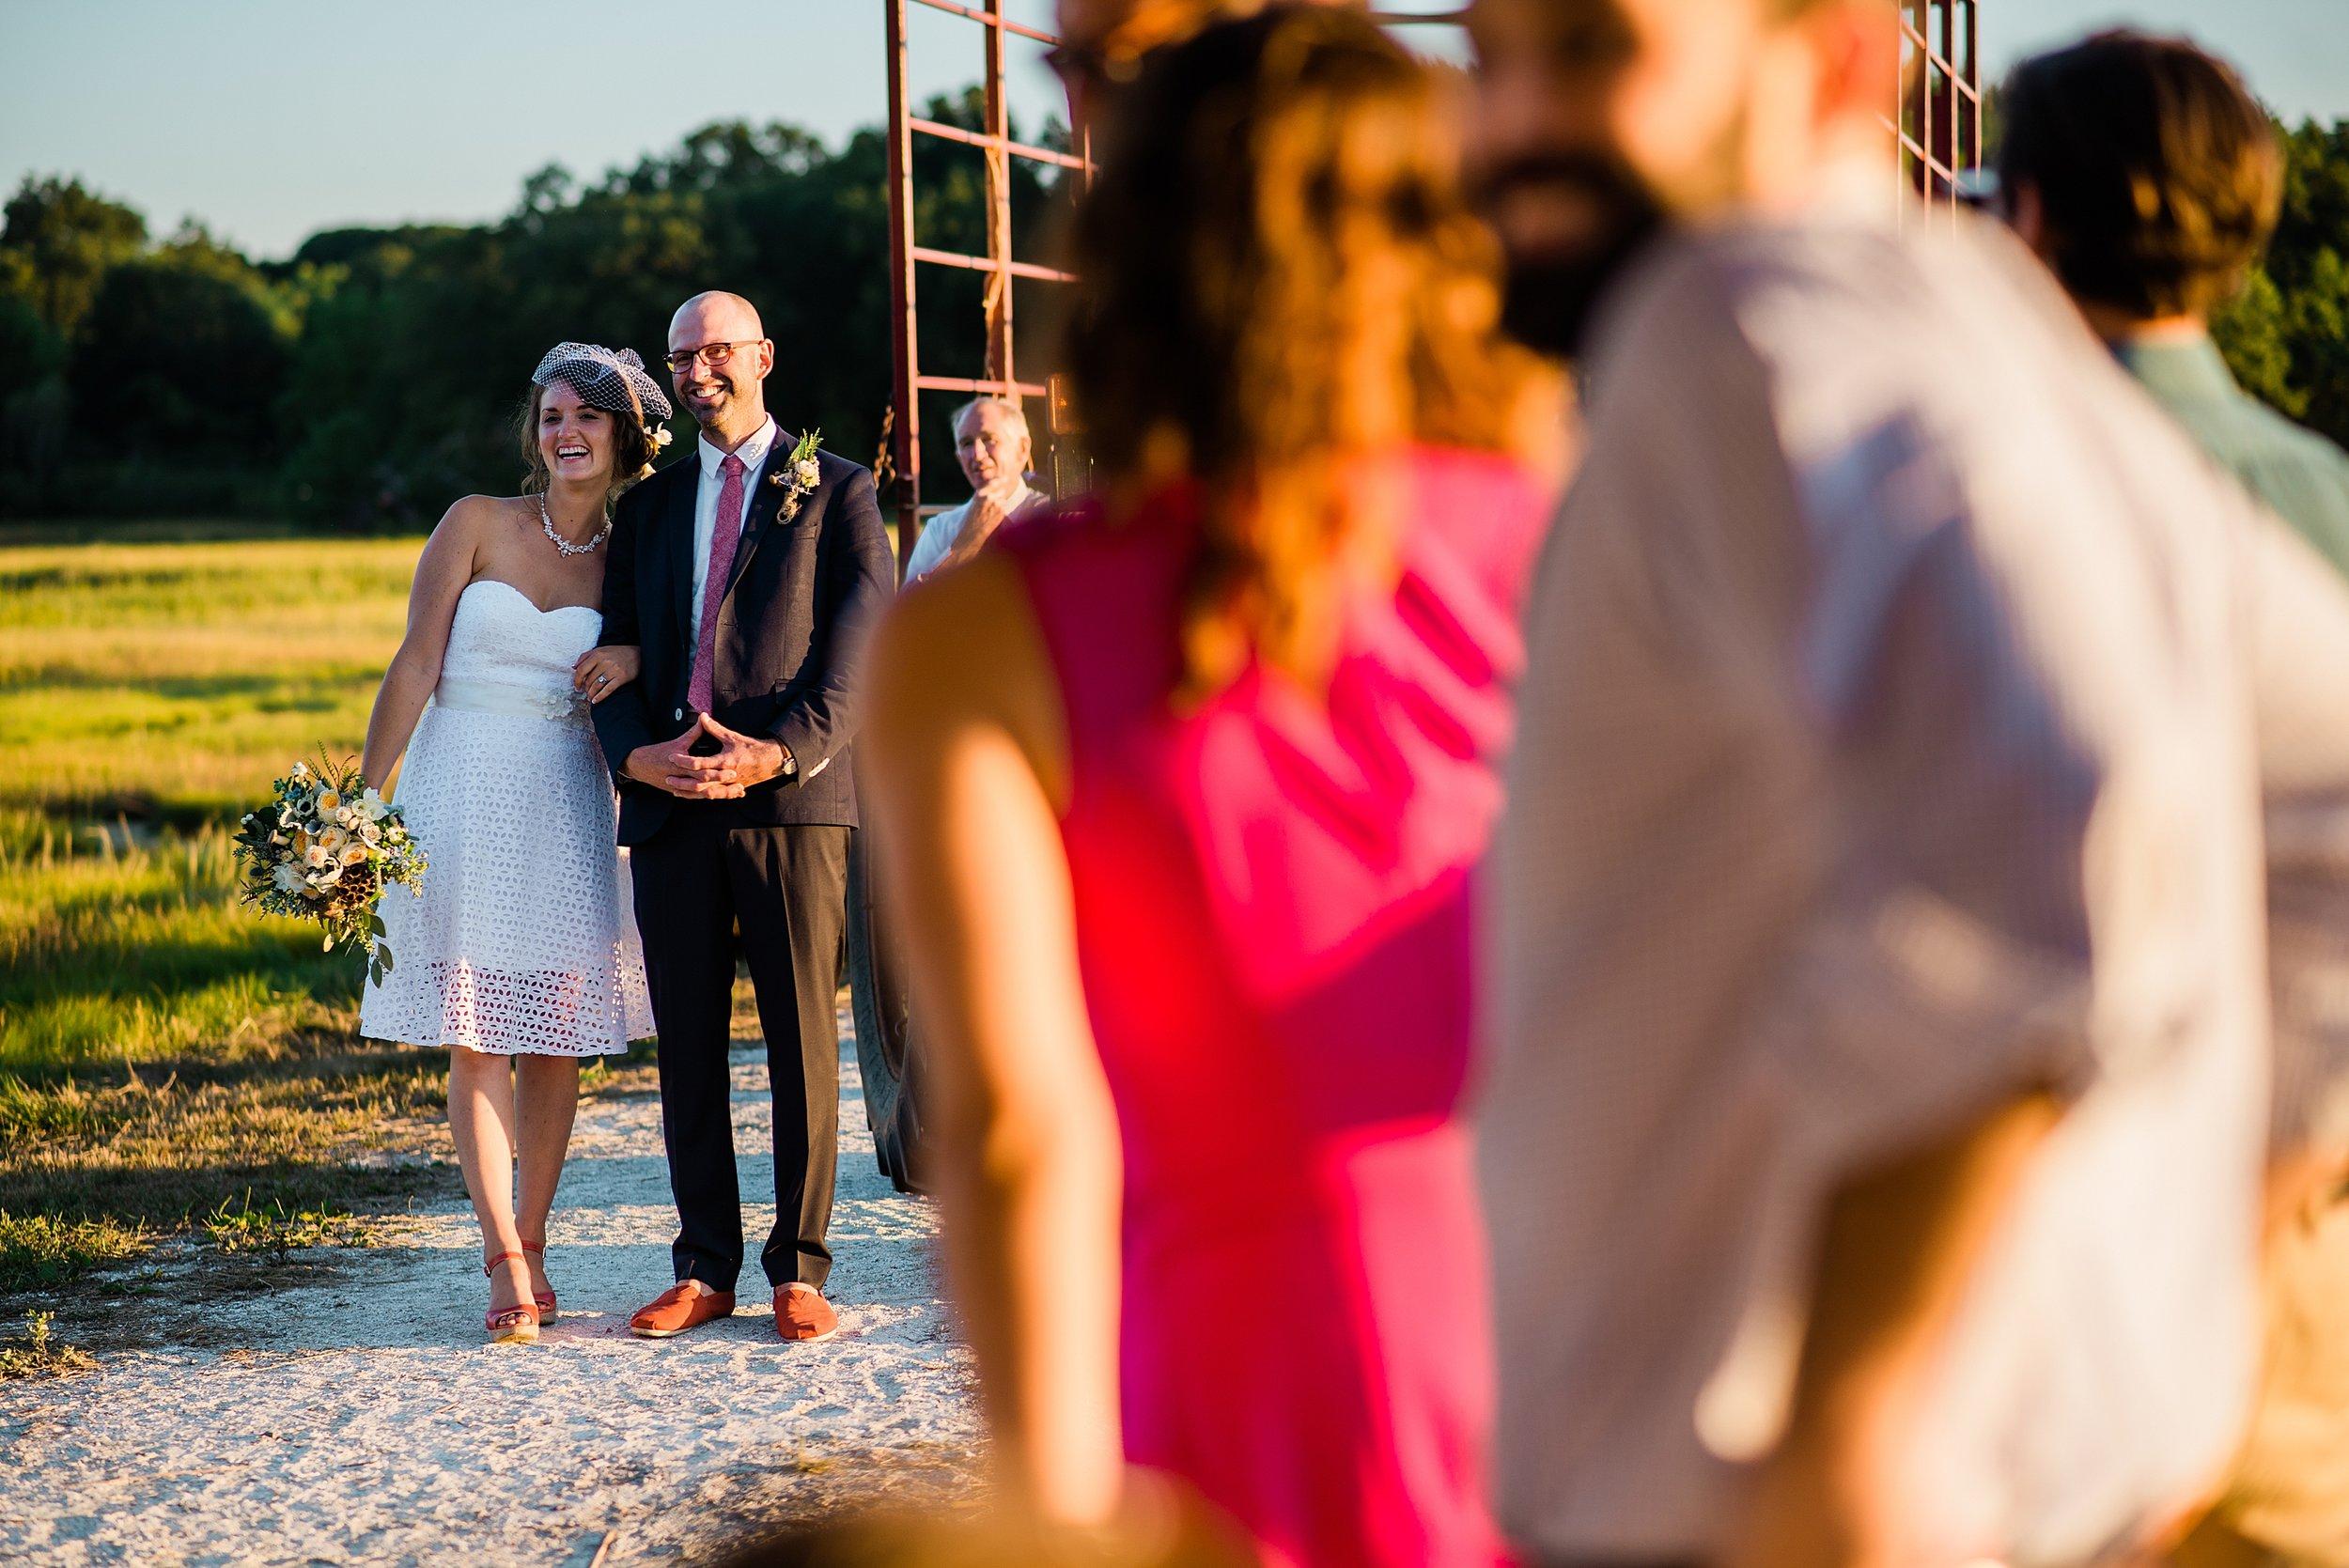 075 los angeles wedding photographer.jpg